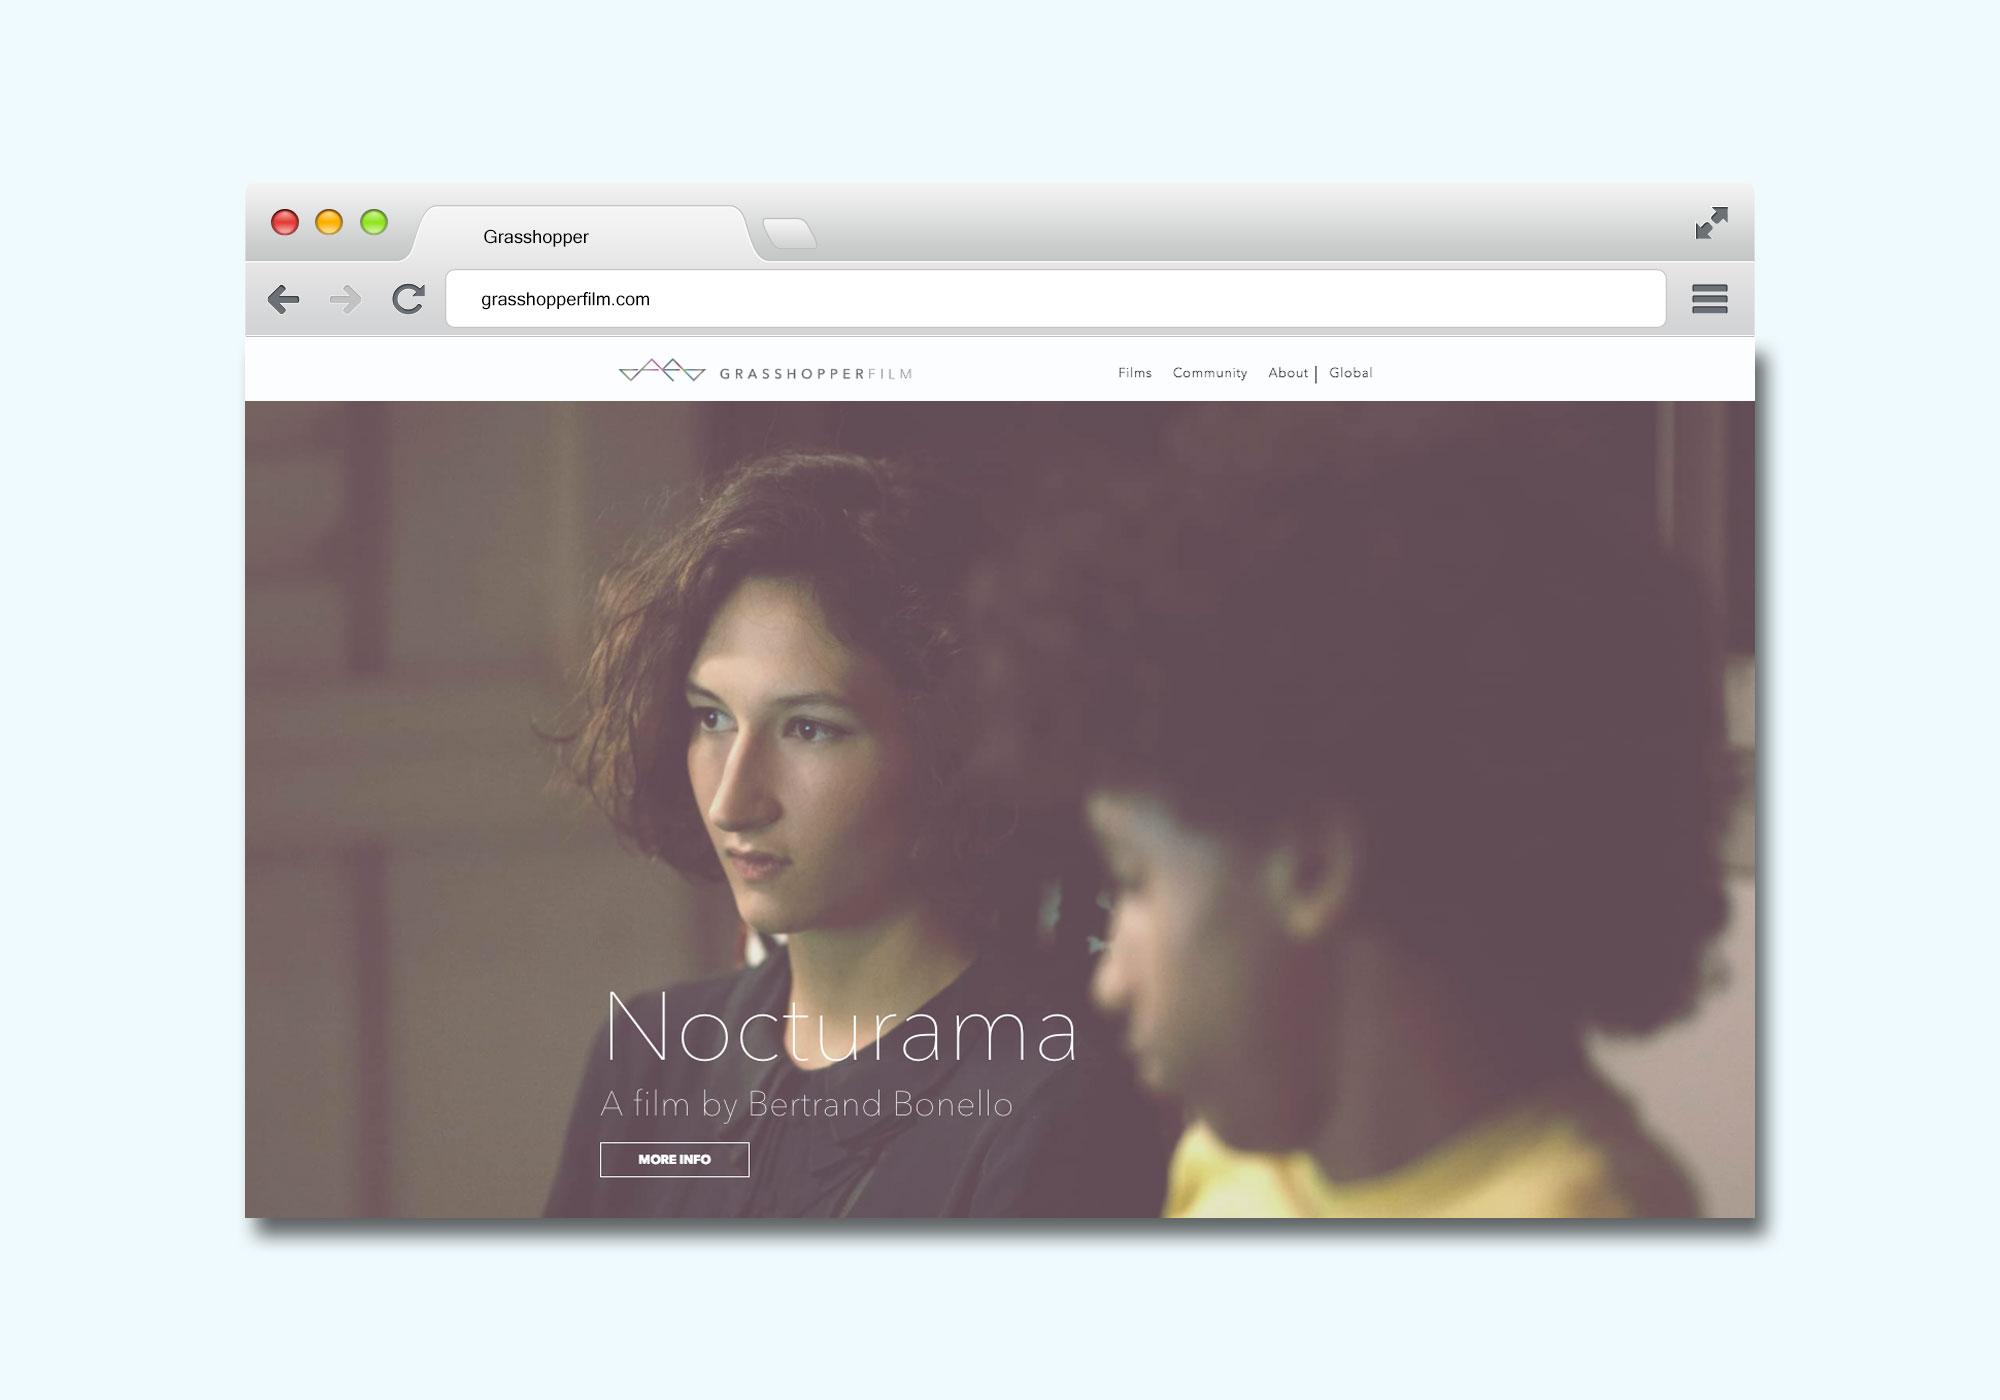 Screenshot of a minimalist website design for filmaker